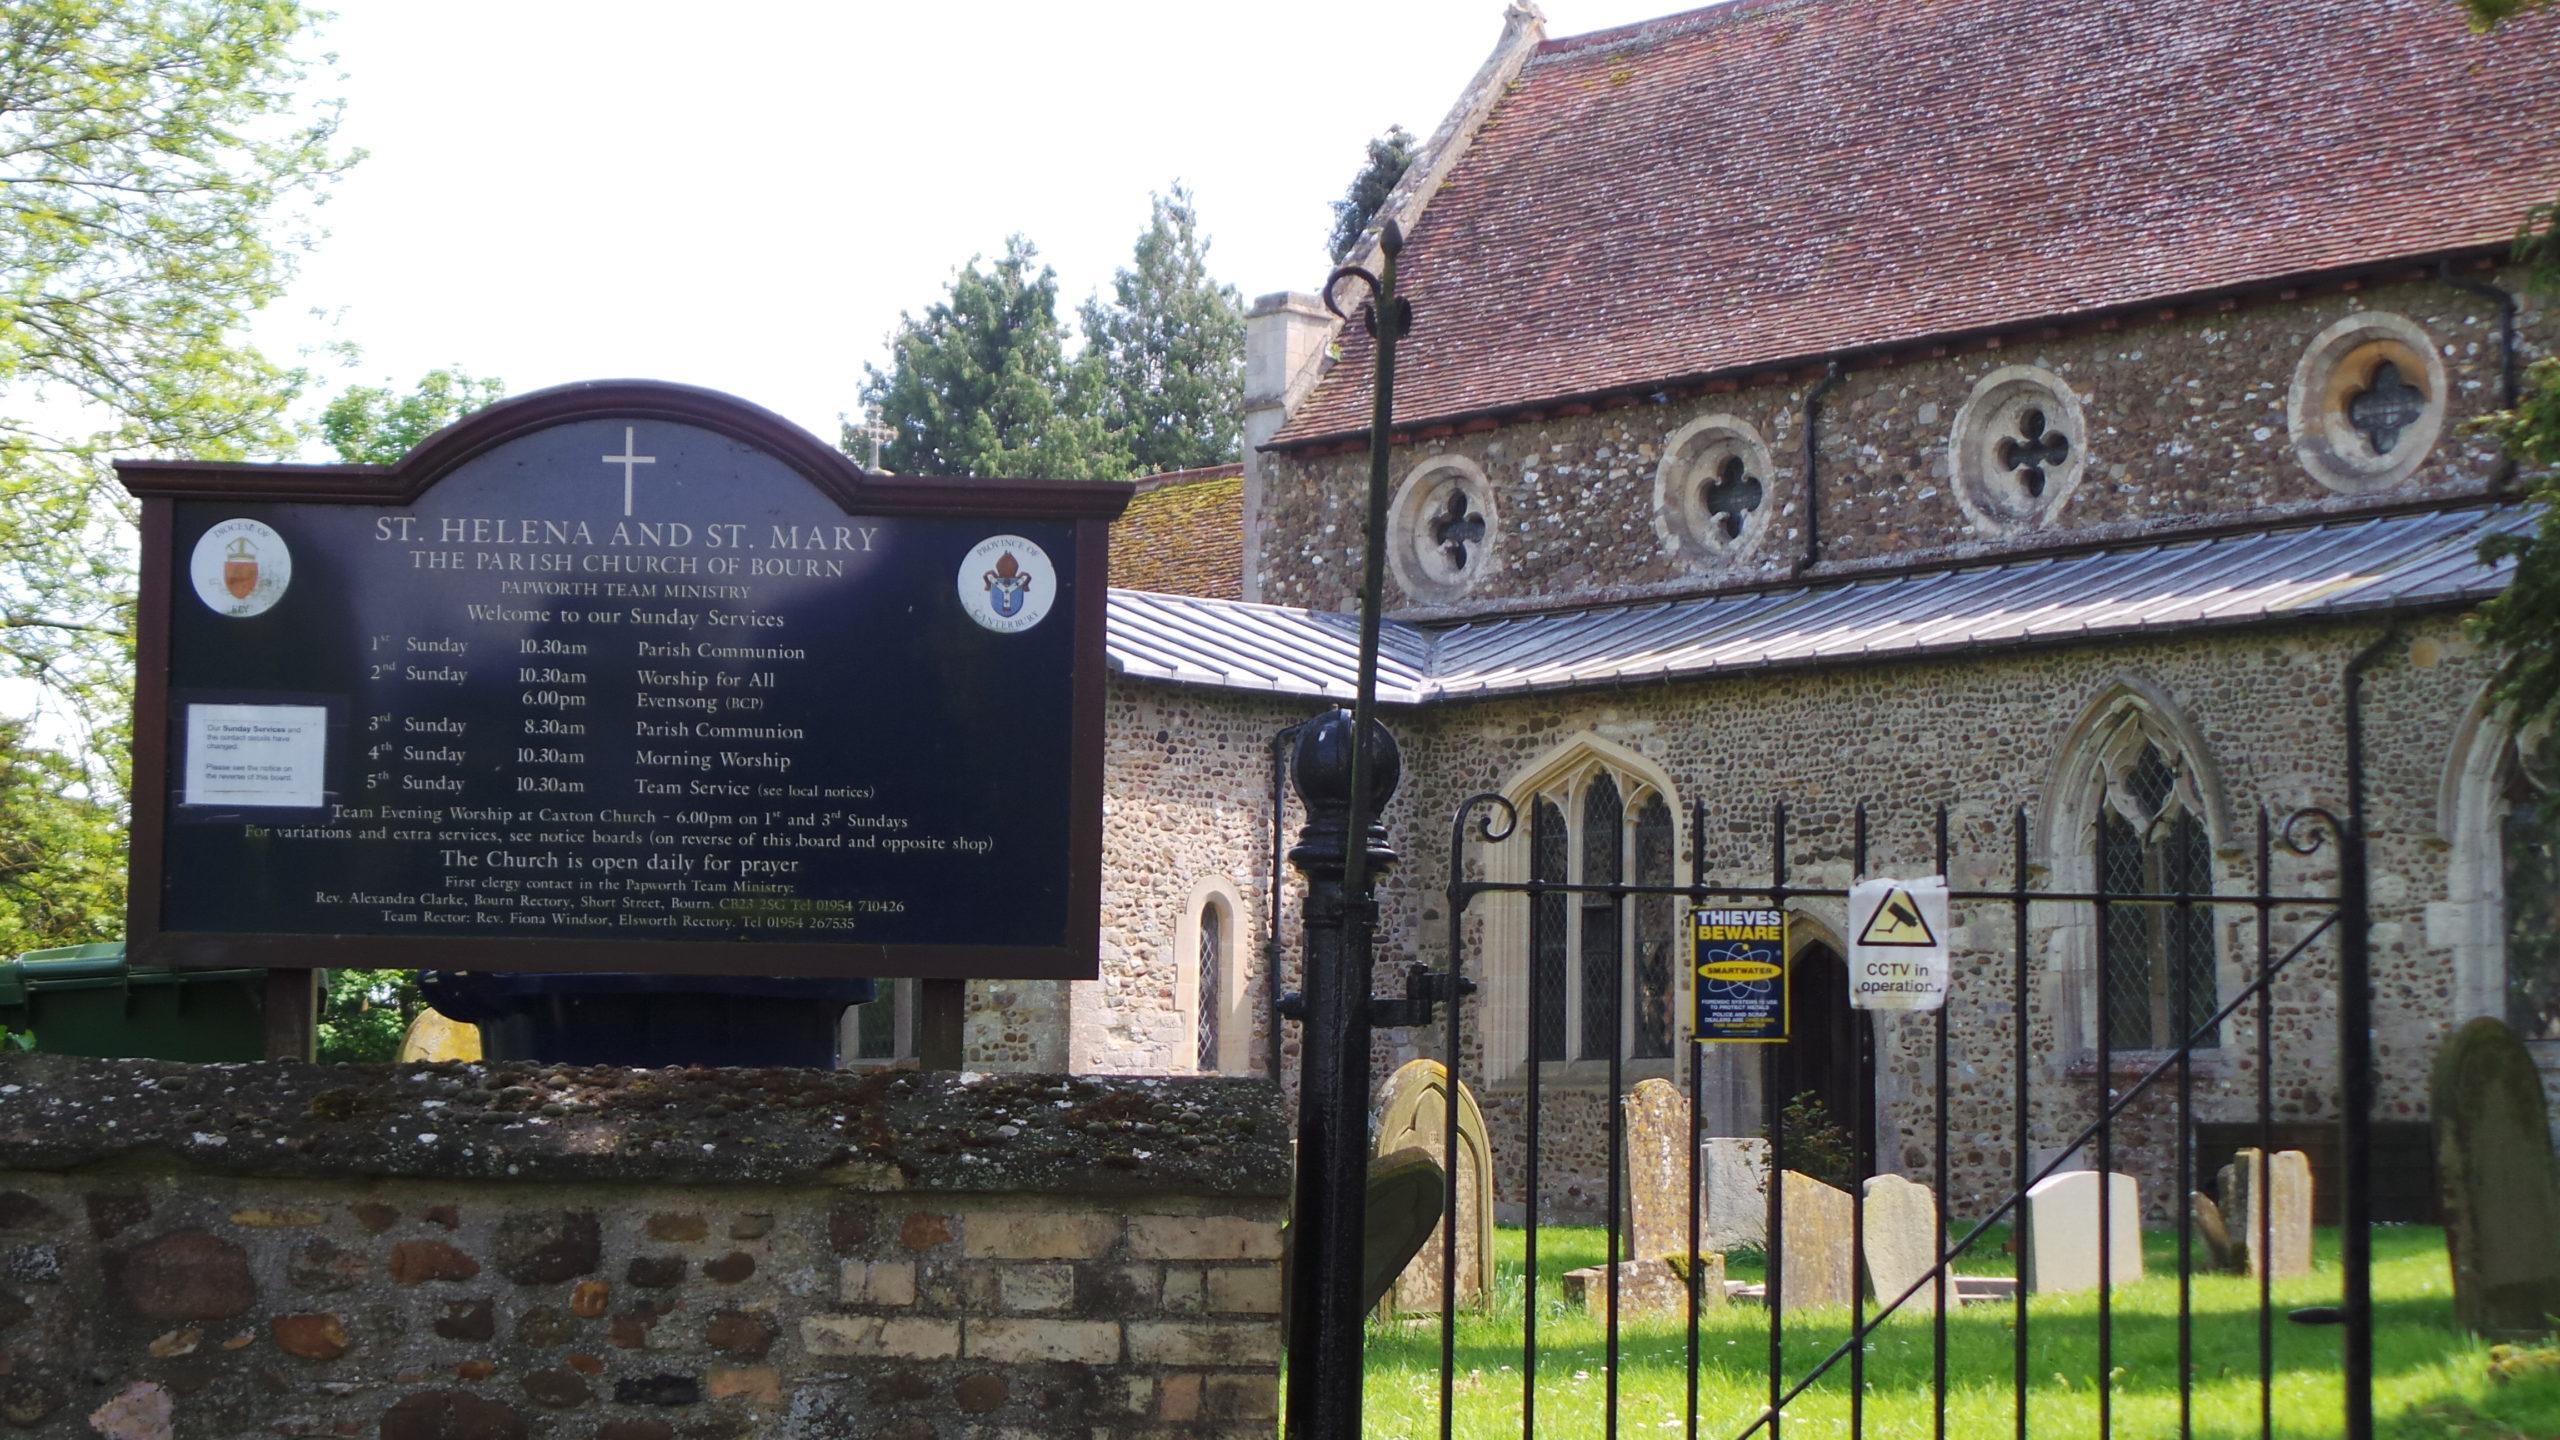 The Bourn church